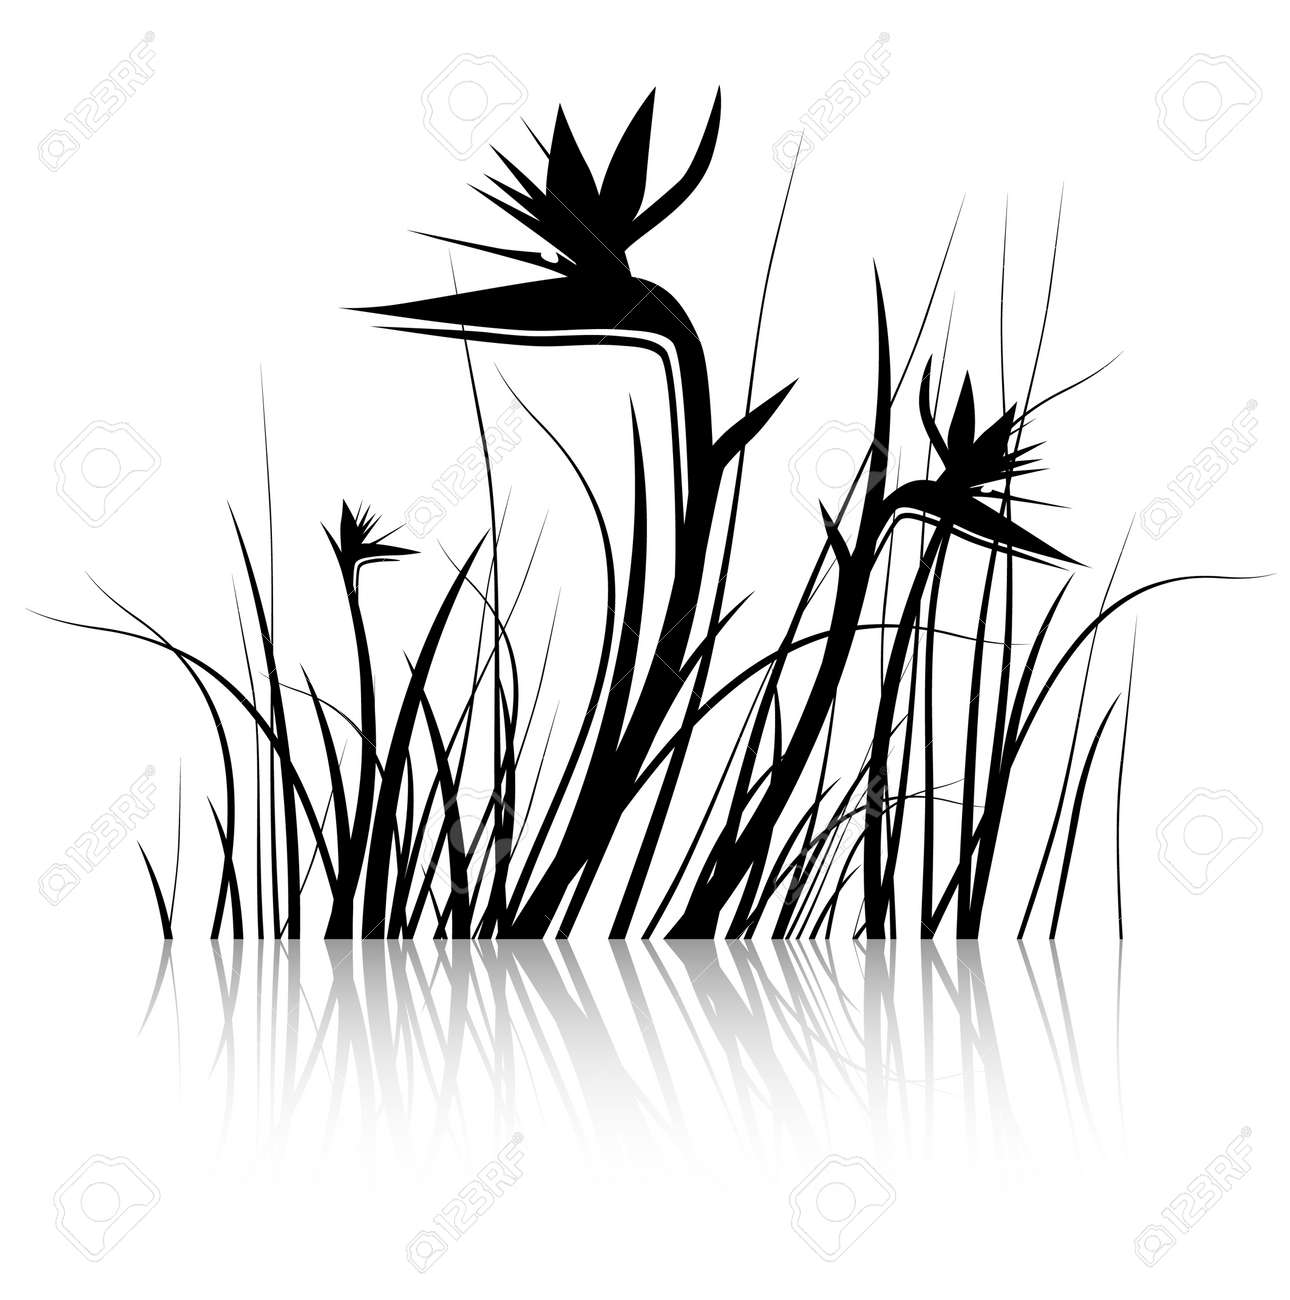 Bird of Paradise Flower (Strelitzia) Silhouette in Black and White Stock Vector - 17665784